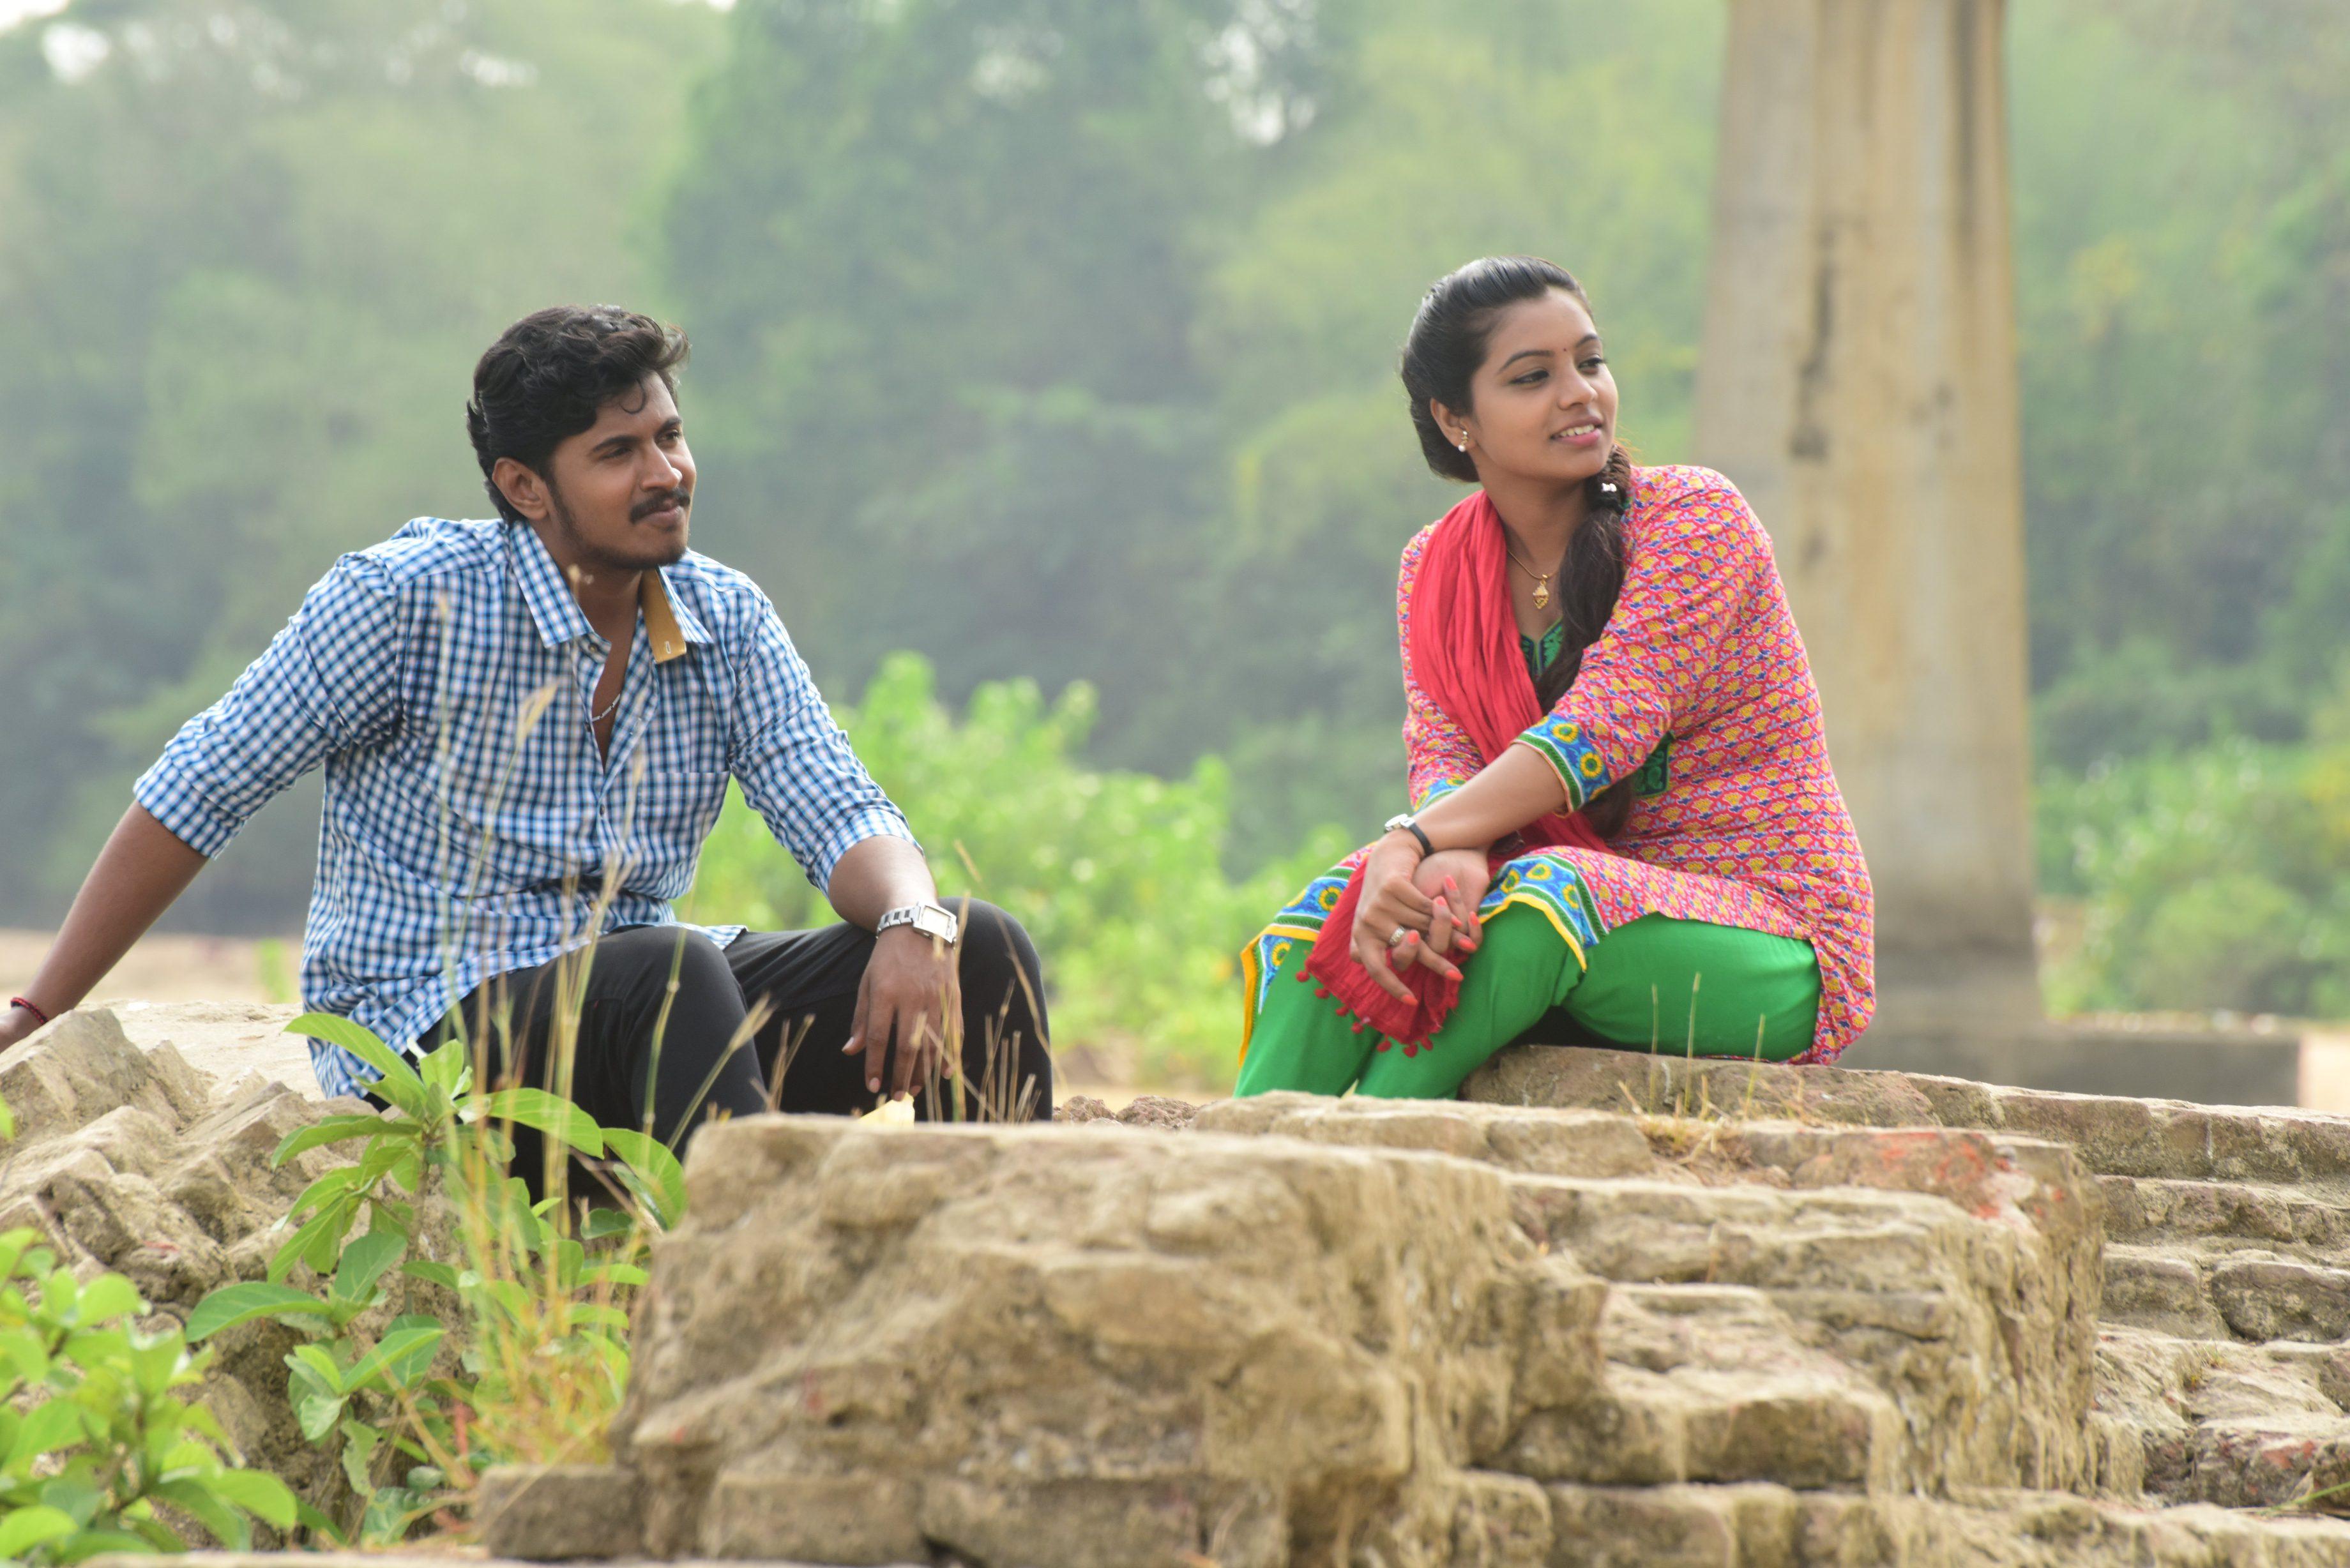 chennai365 | pichuva kaththi movie stills | chennai365